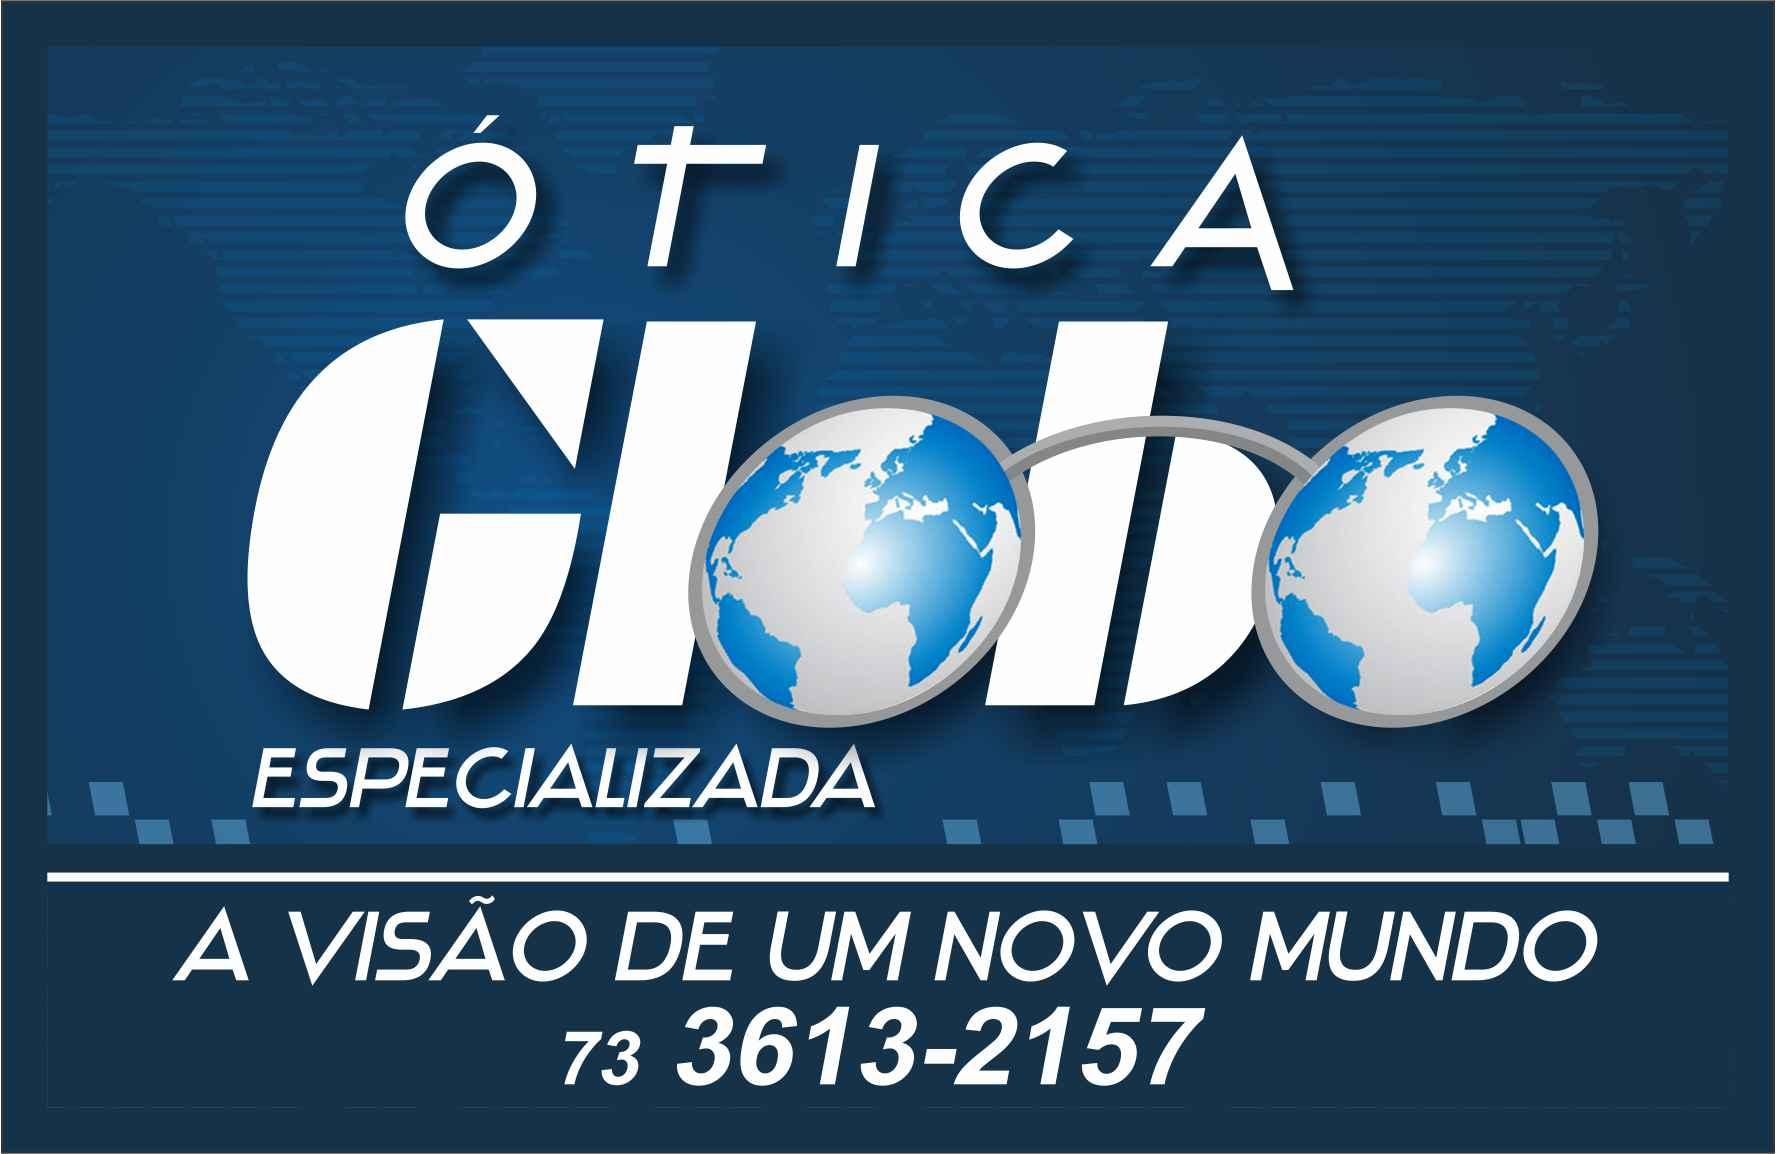 https://www.facebook.com/oticagloboita?fref=ts